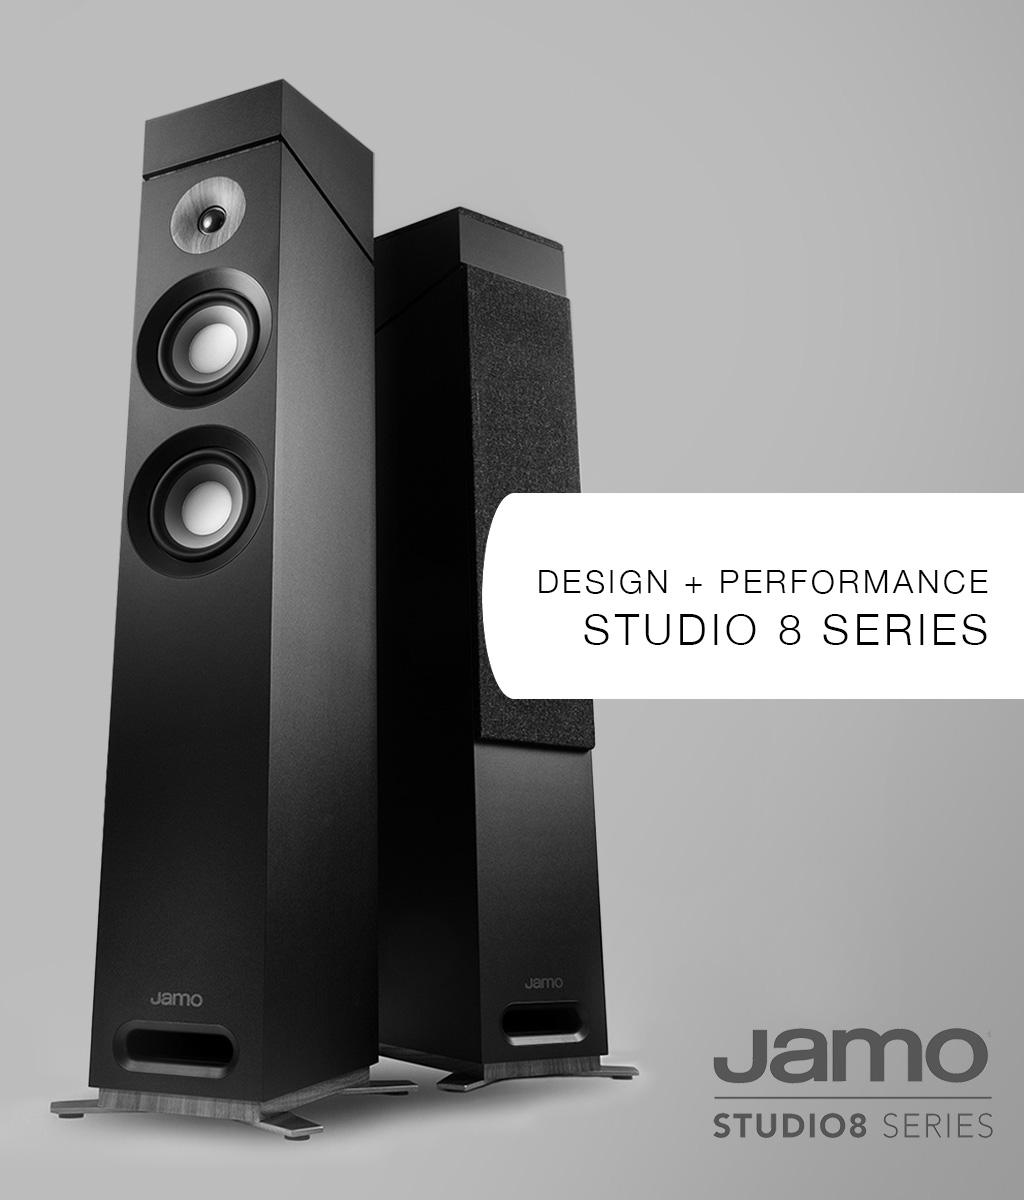 Jamo Studio8 series